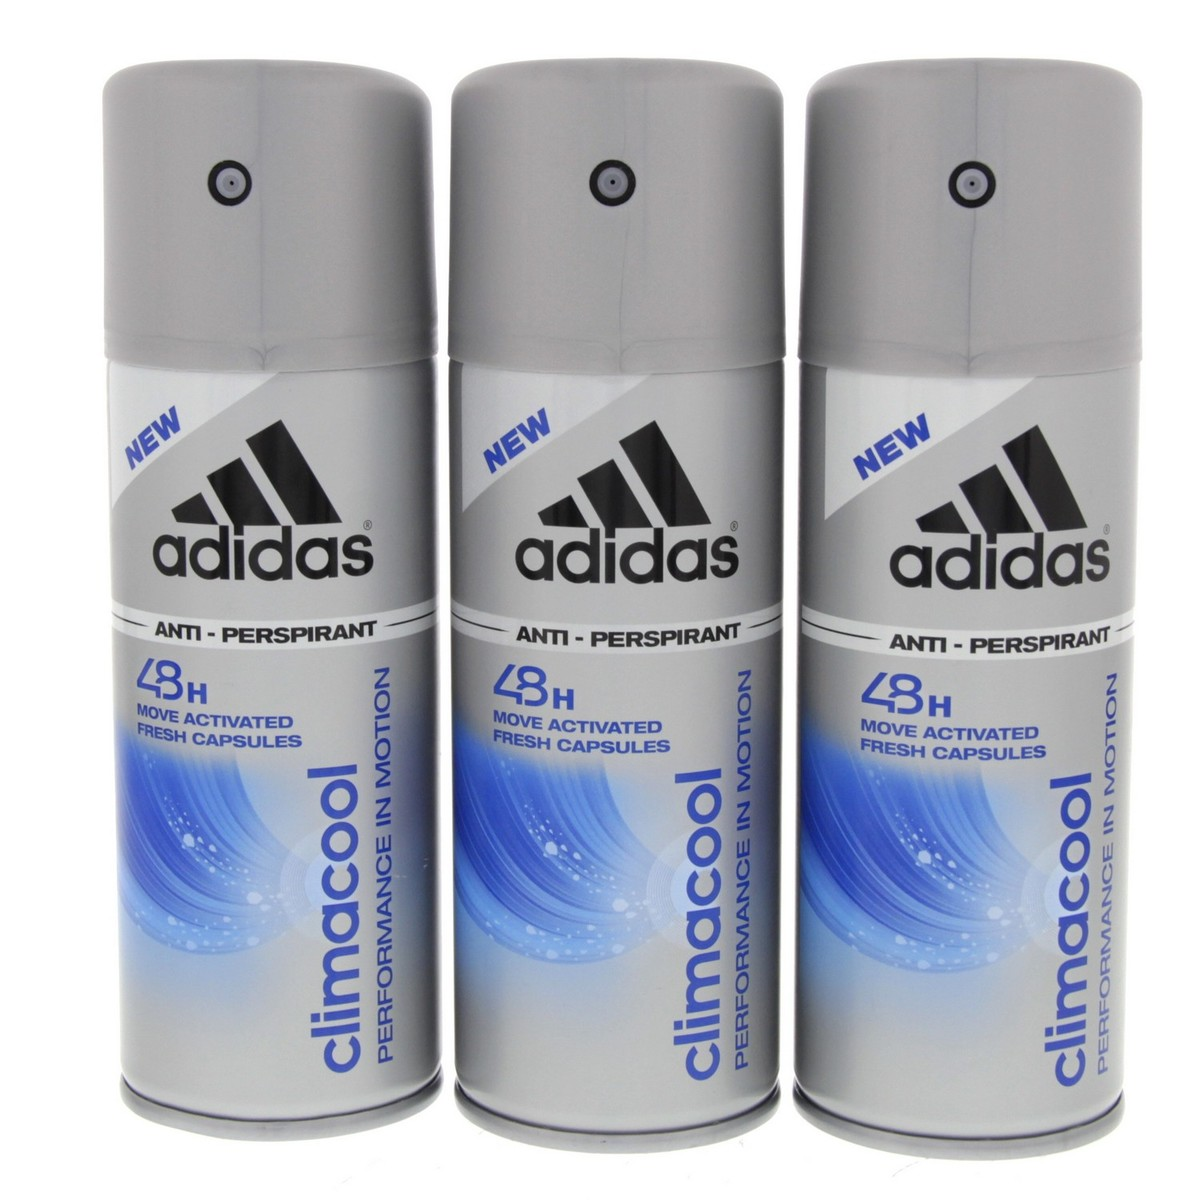 Buy Adidas Deo Body Spray Climacool 150ml x 3pcs Online